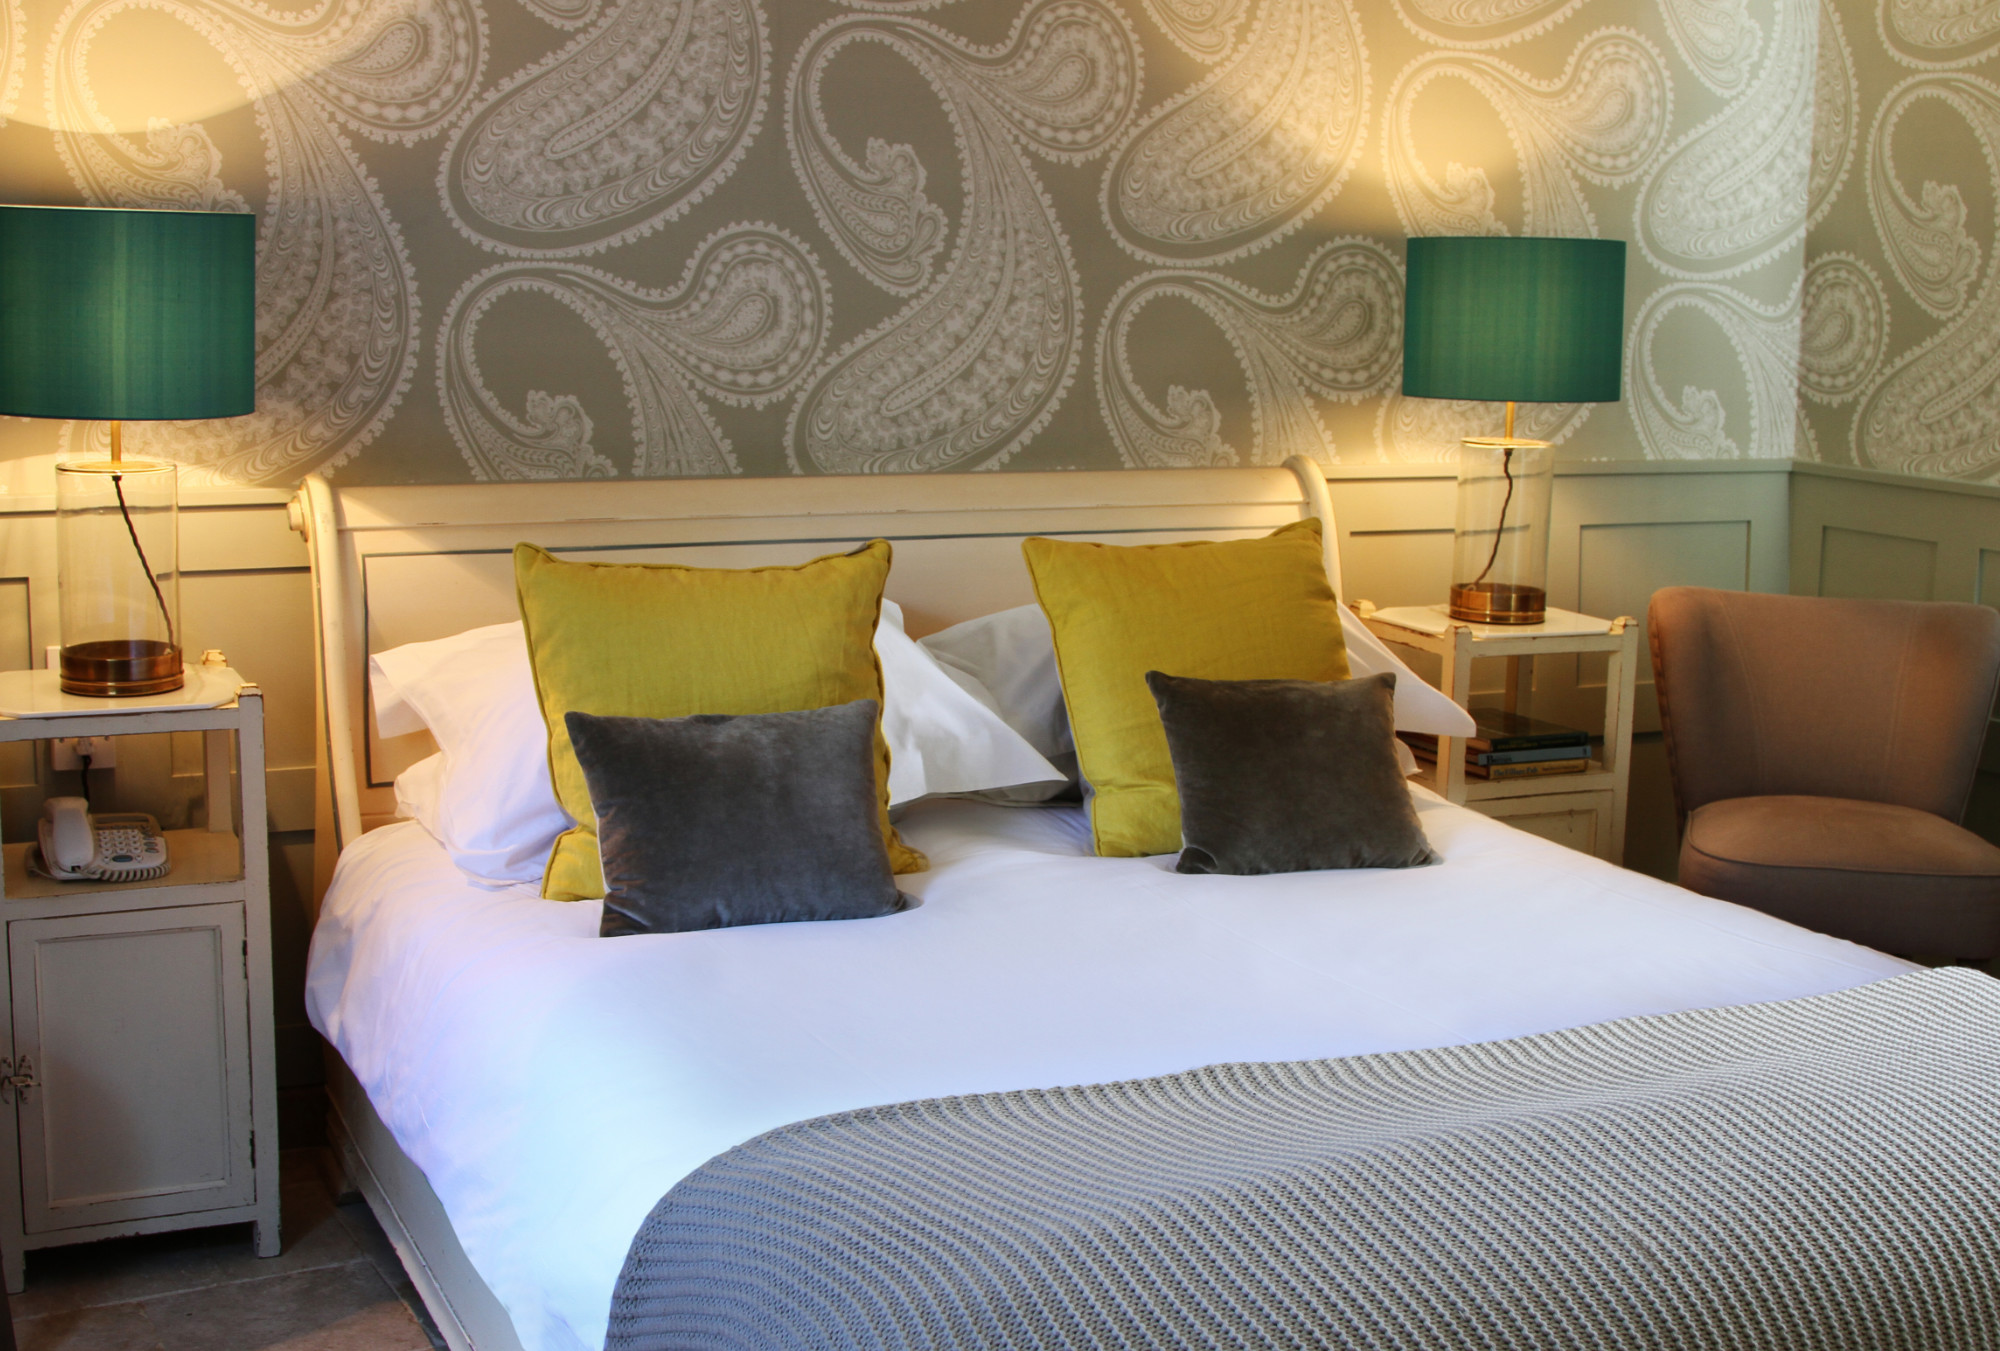 Kings Head Inn Bedroom 7 The Cool Hotel Guide